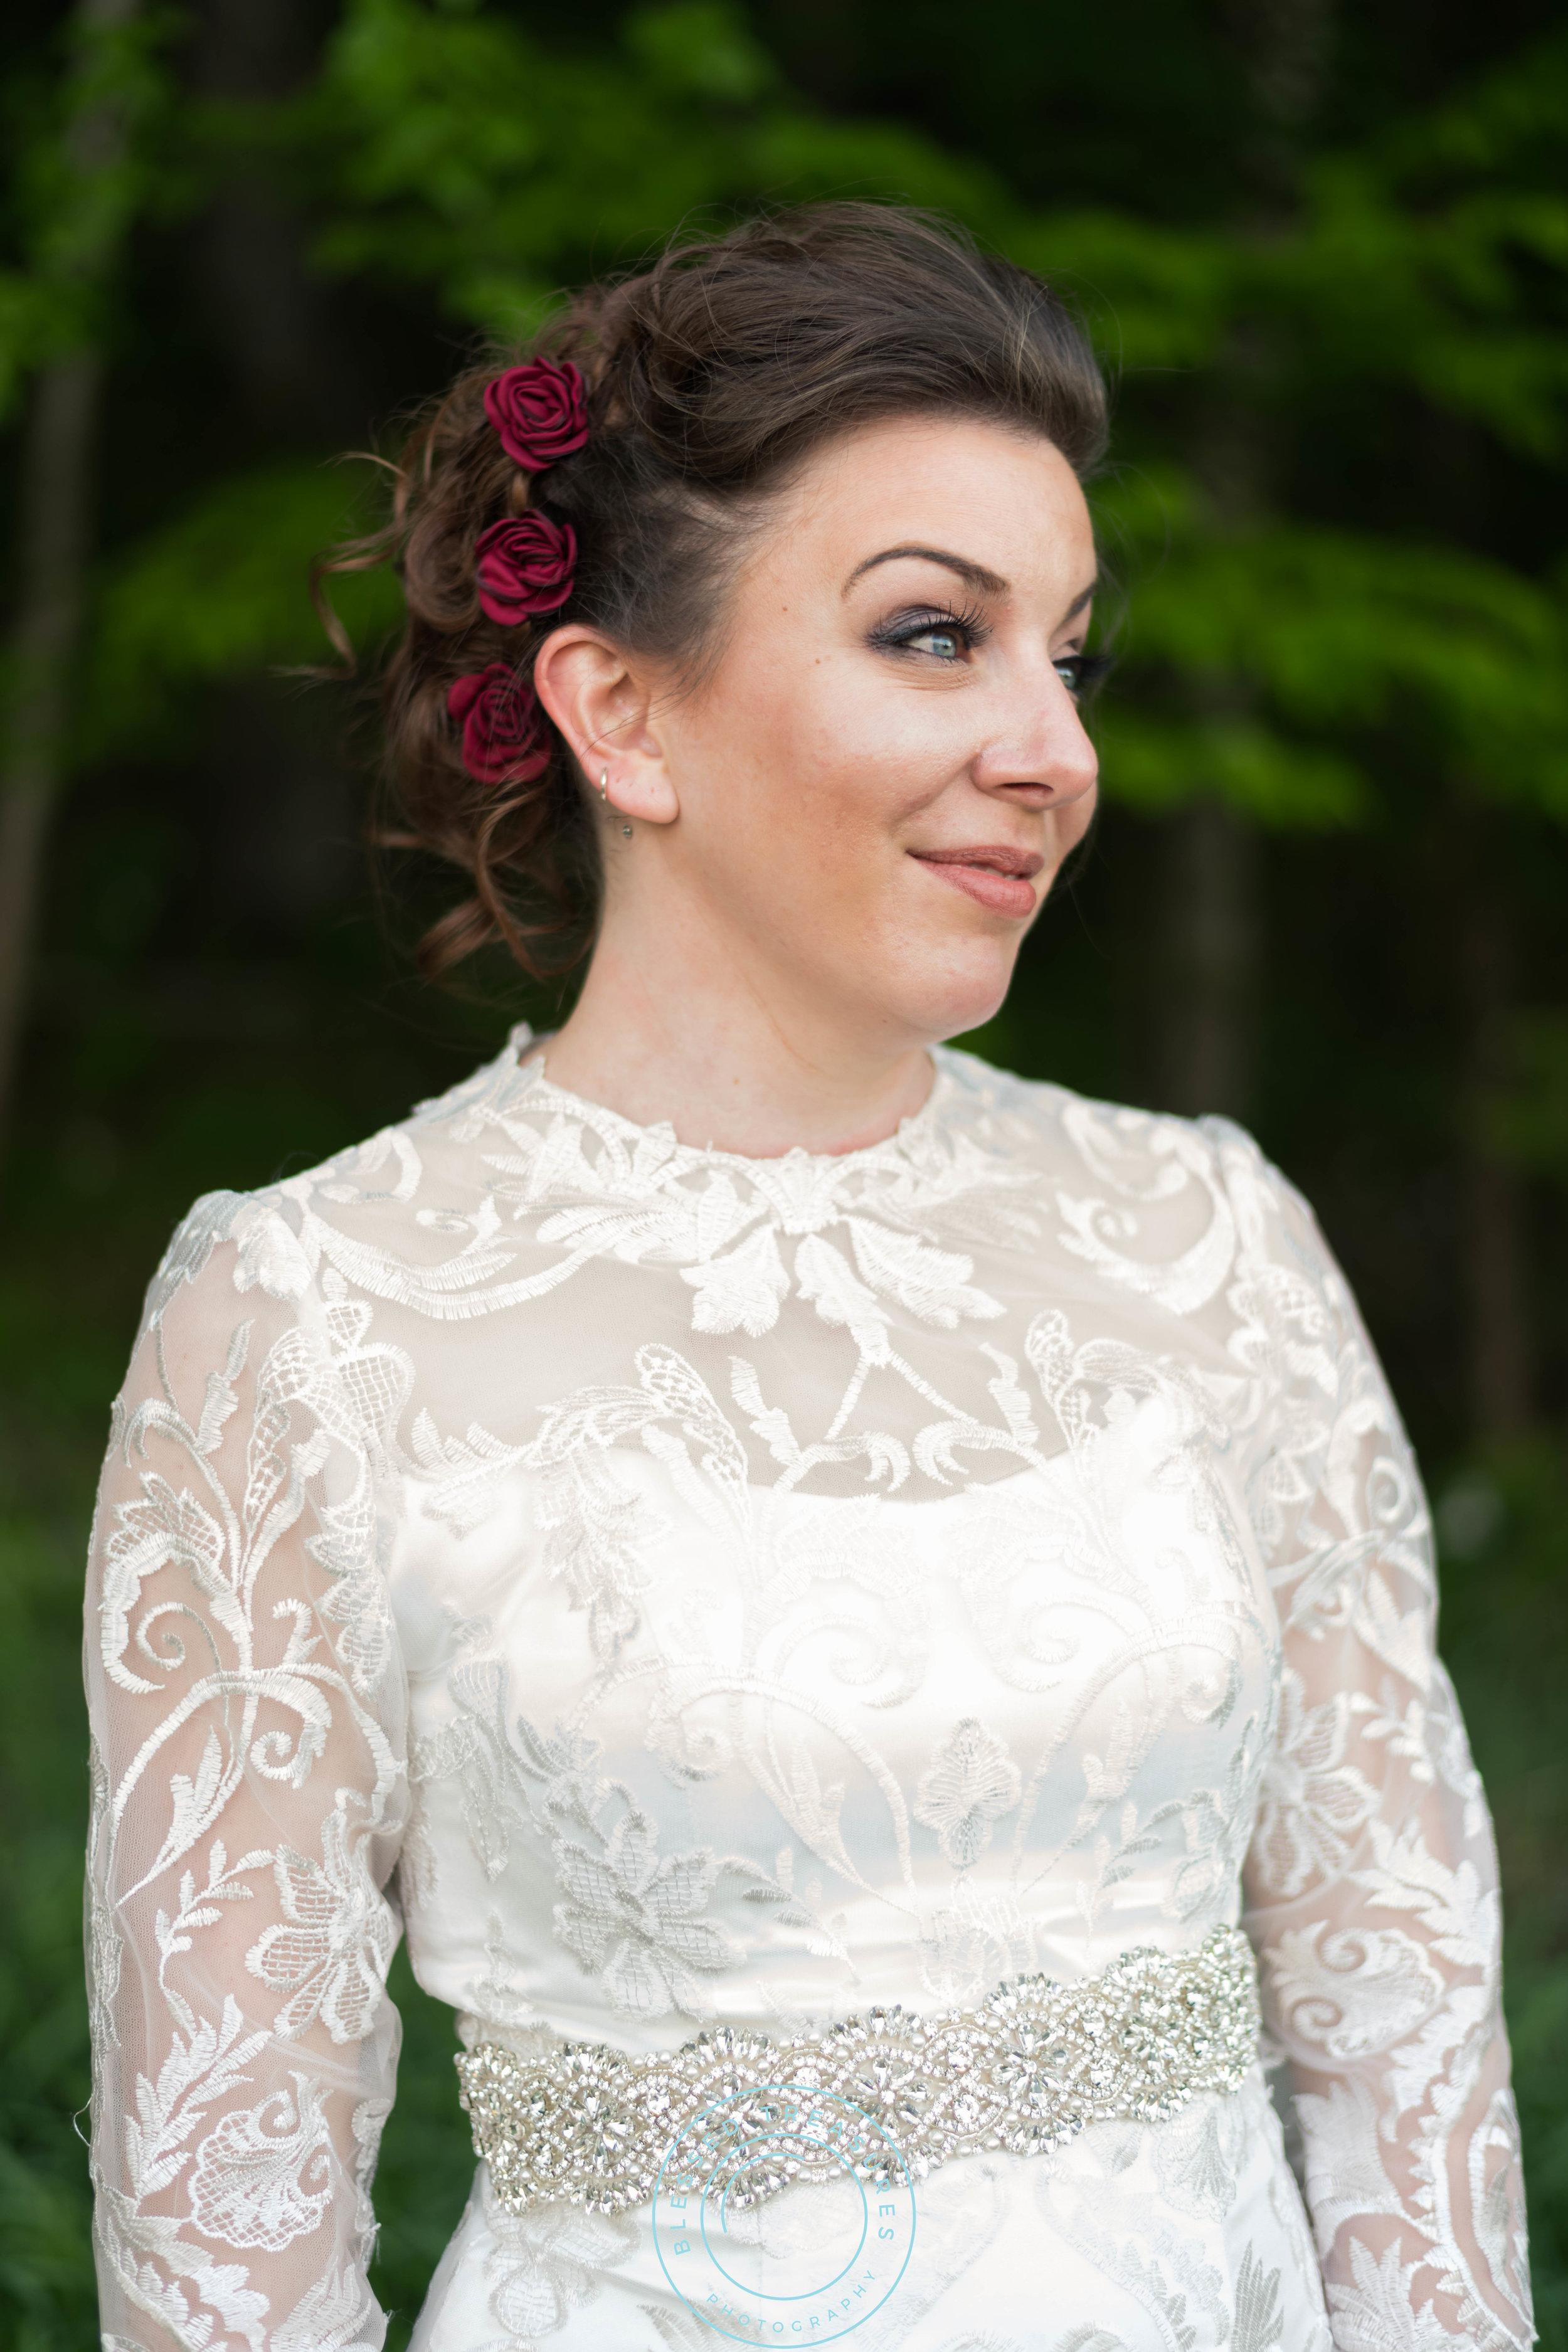 curly brunette wedding updo red roses smokey eye natural makeup lace wedding dress long sleeved beaded sash